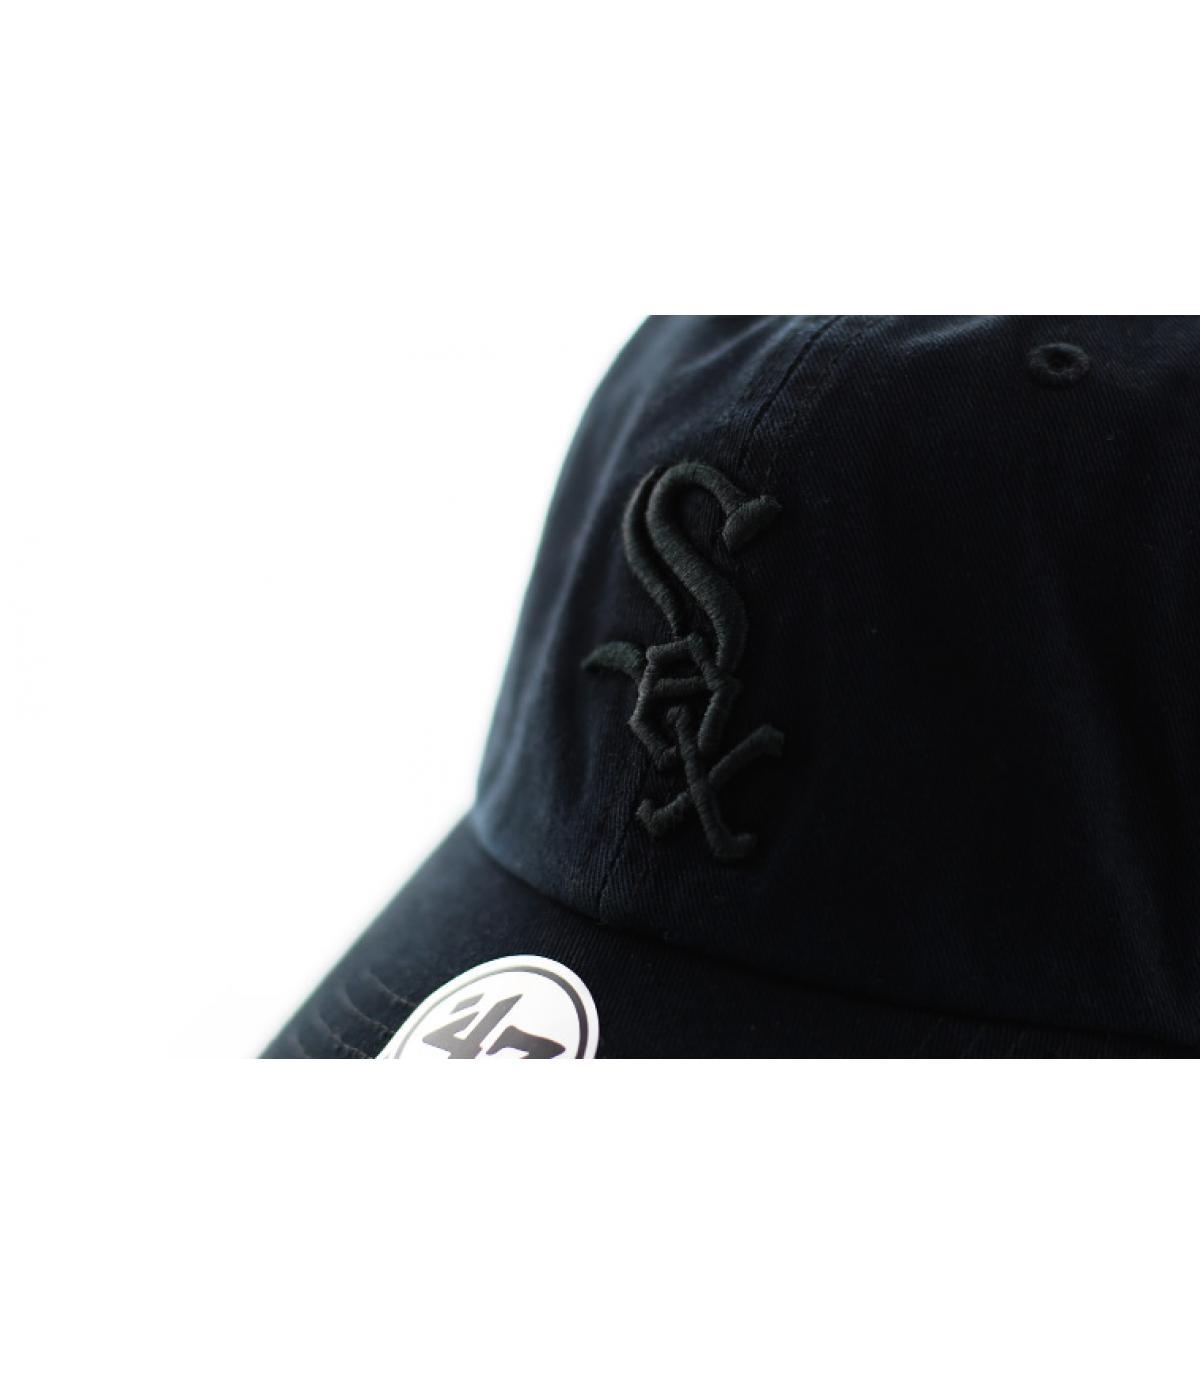 Details Clean Up Sox all black - Abbildung 3